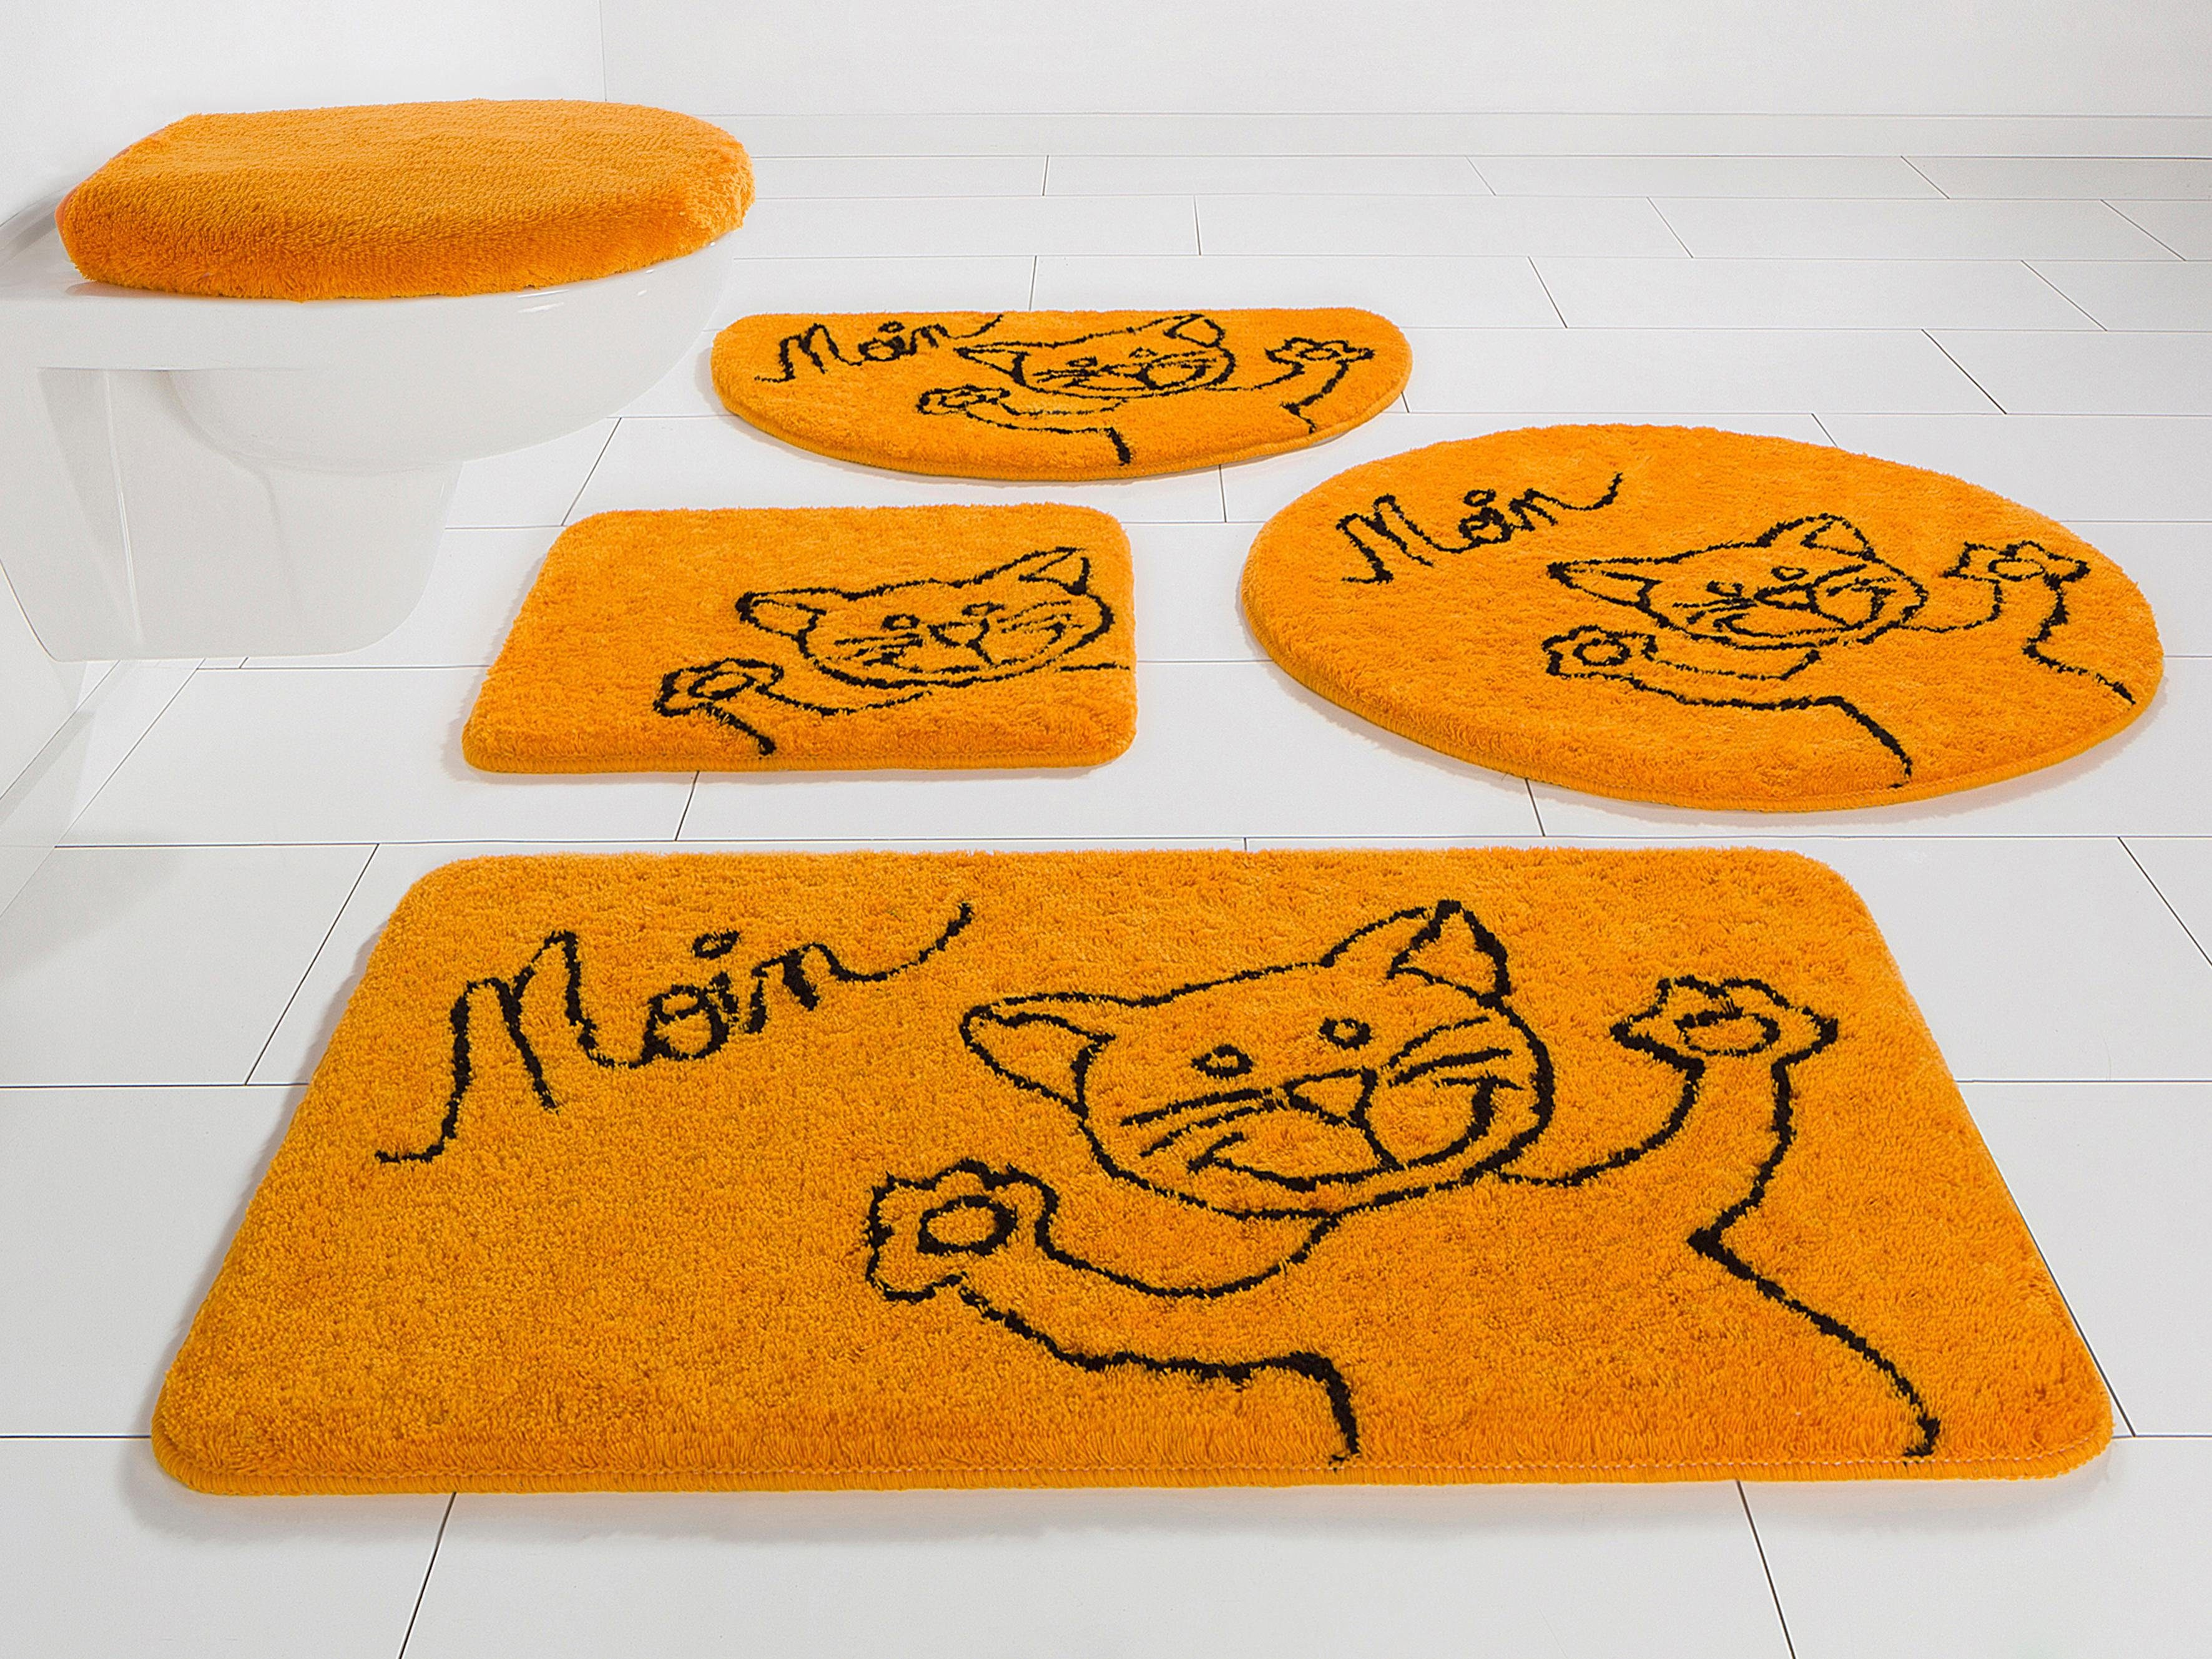 Badematte »Katze« my home, Höhe 15 mm, rutschhemmend beschichtet, fußbodenheizungsgeeignet